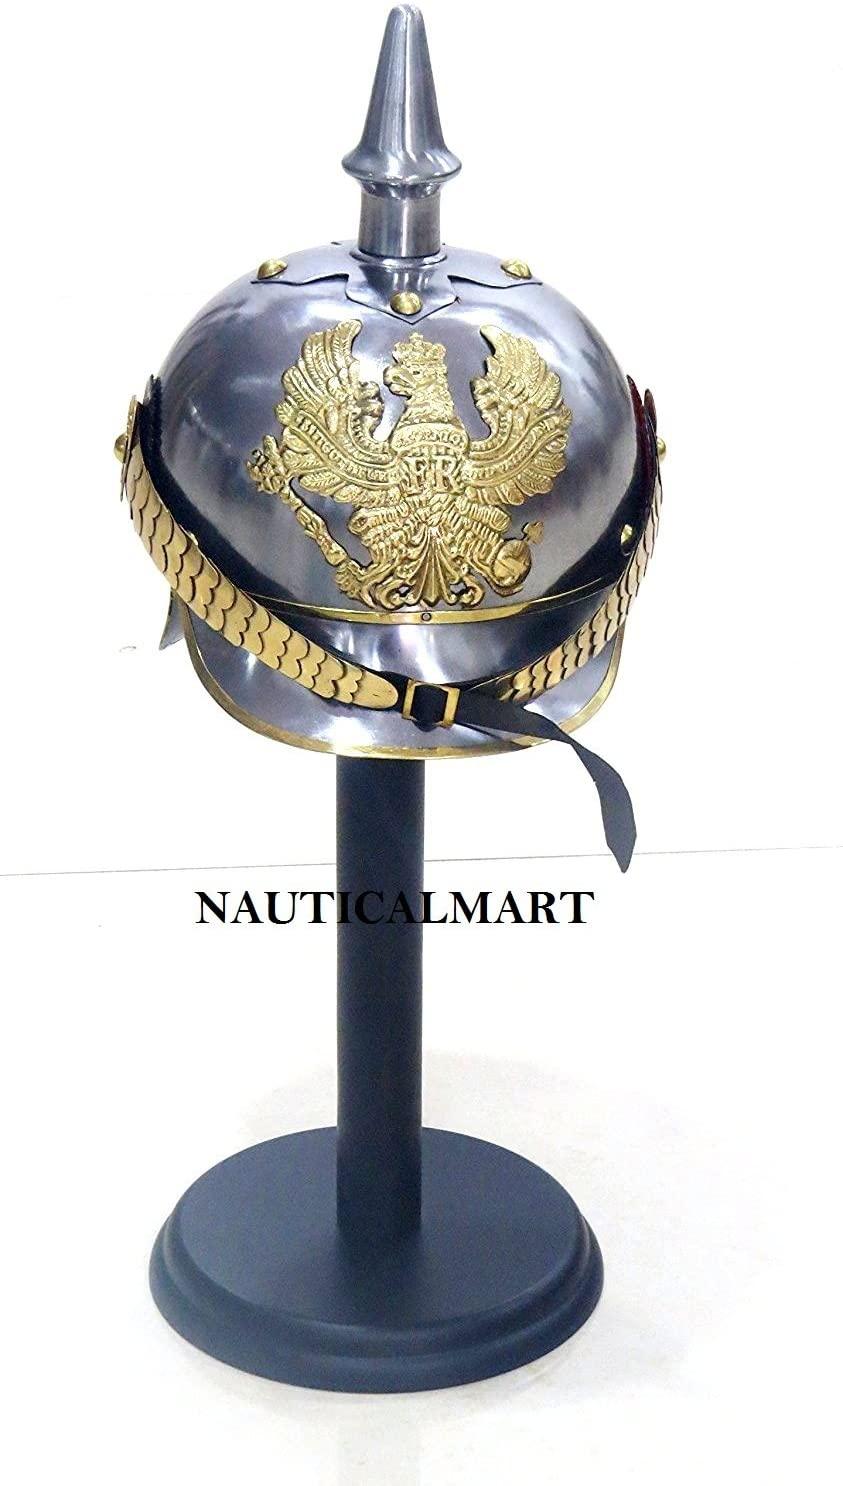 NauticalMart WWII German Pickelhaube Helmet